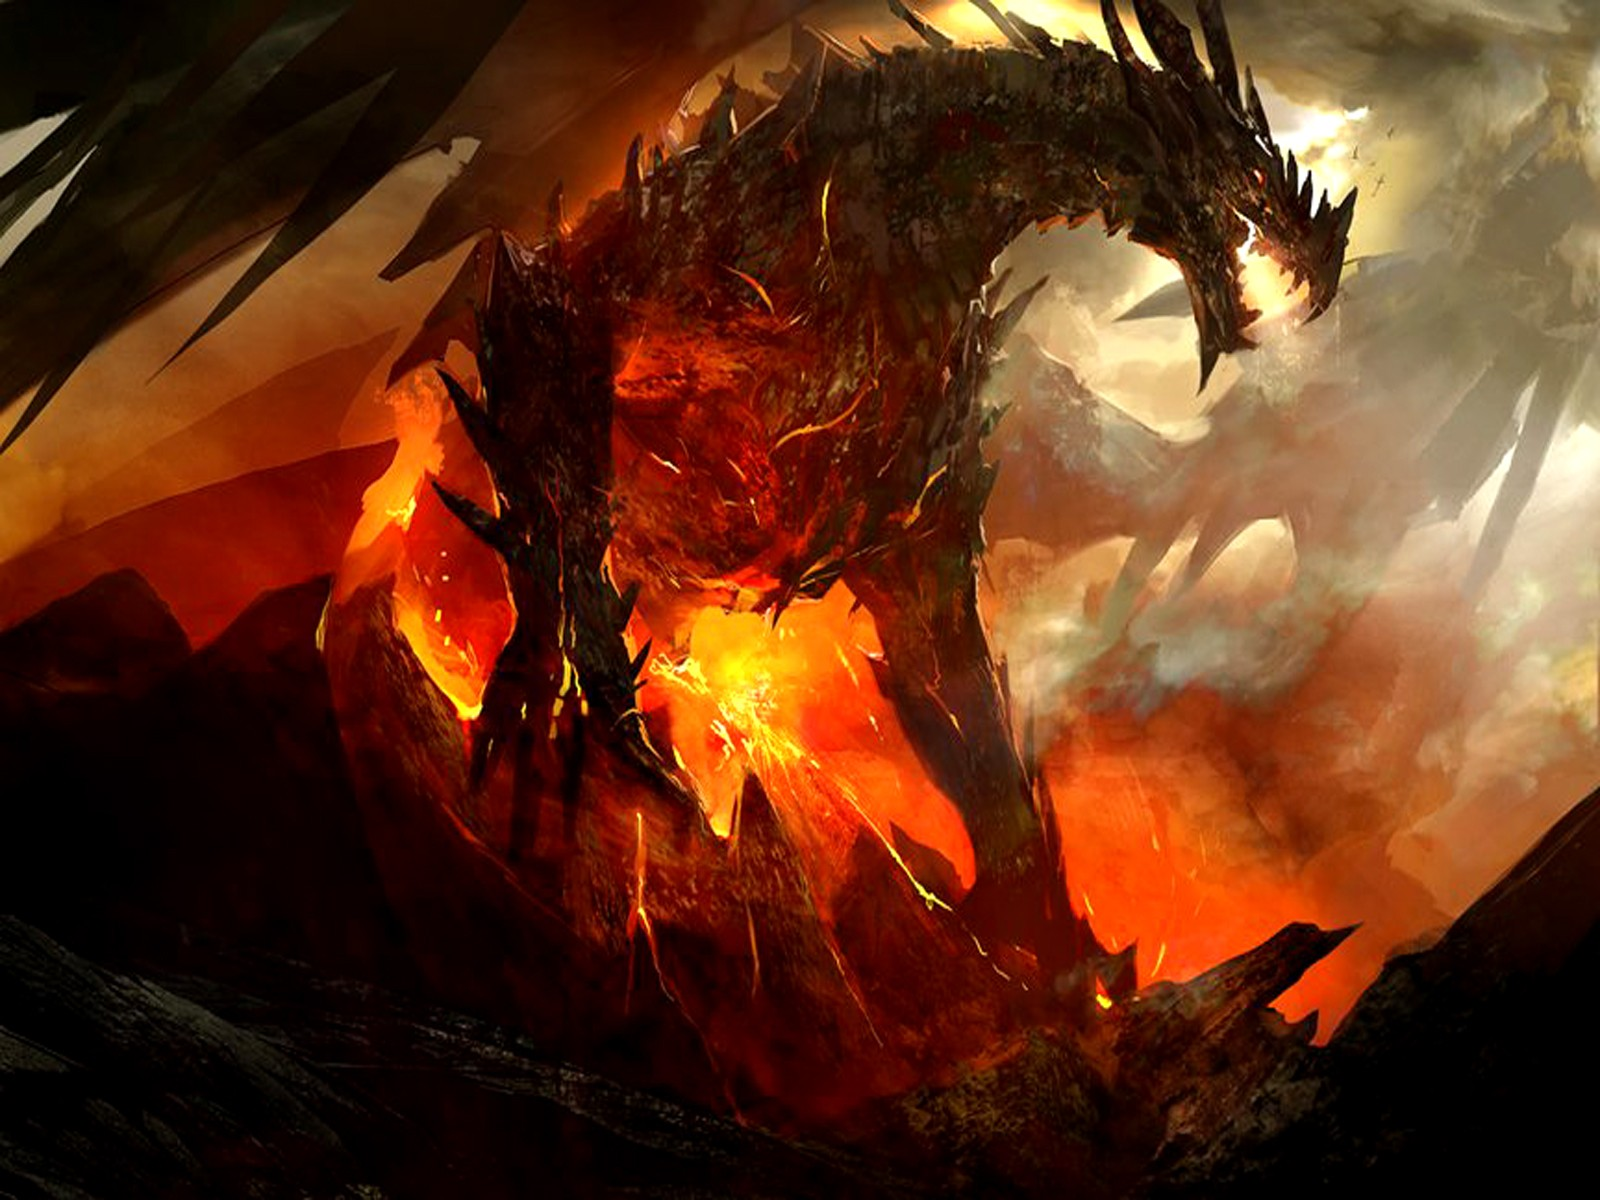 Download Dragons Fire Wallpaper 1600x1200 Wallpoper 245720 1600x1200